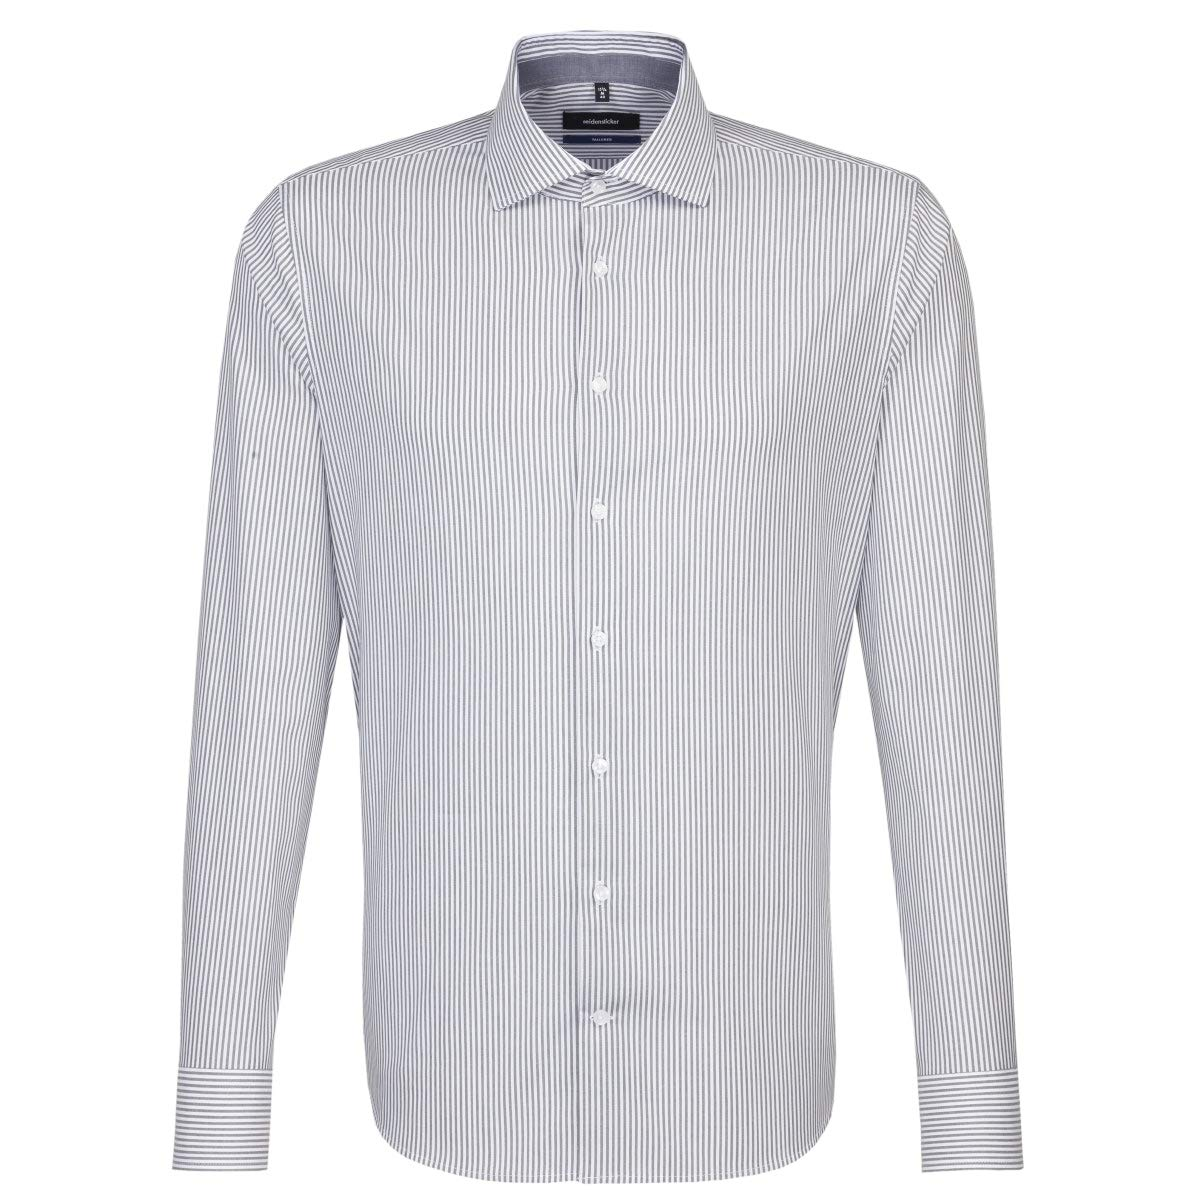 Seidensticker - Camisa Formal - Rayas - Clásico - para Hombre